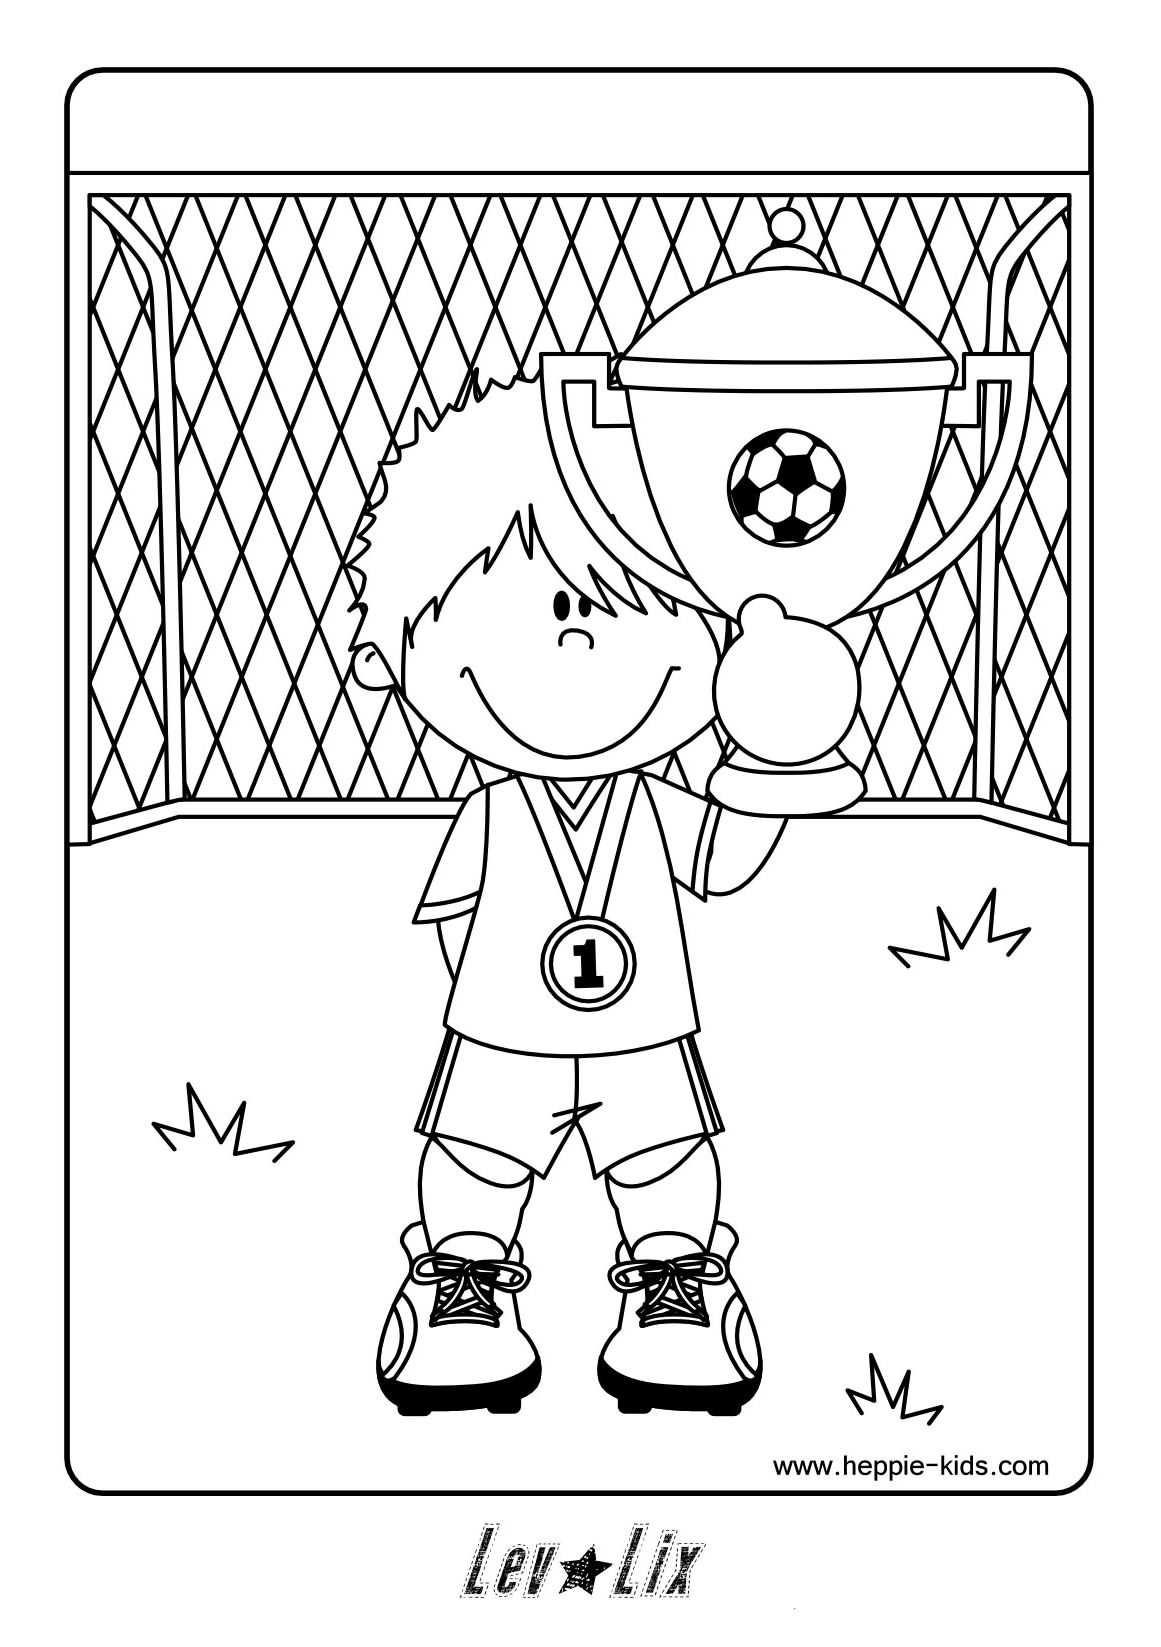 Kleurplaat Voetbal Kleurplaten Voetbal Knutselen